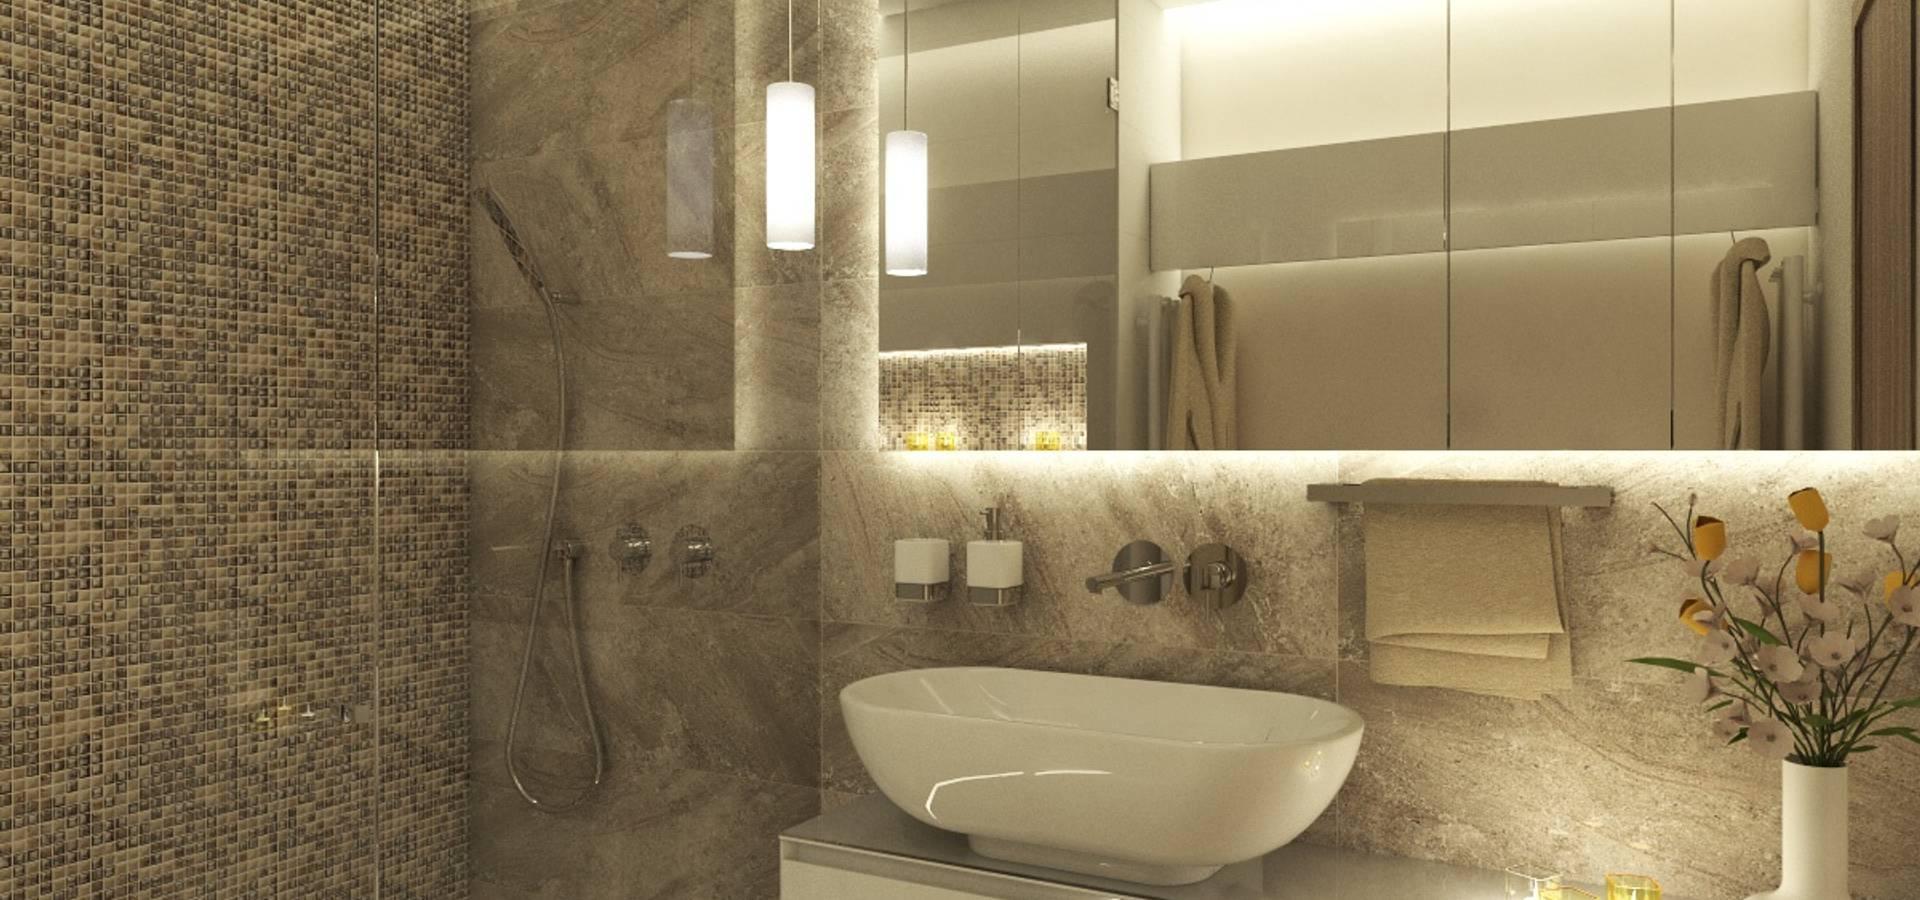 Natur- Badezimmer FUJI von Perfecto design | homify